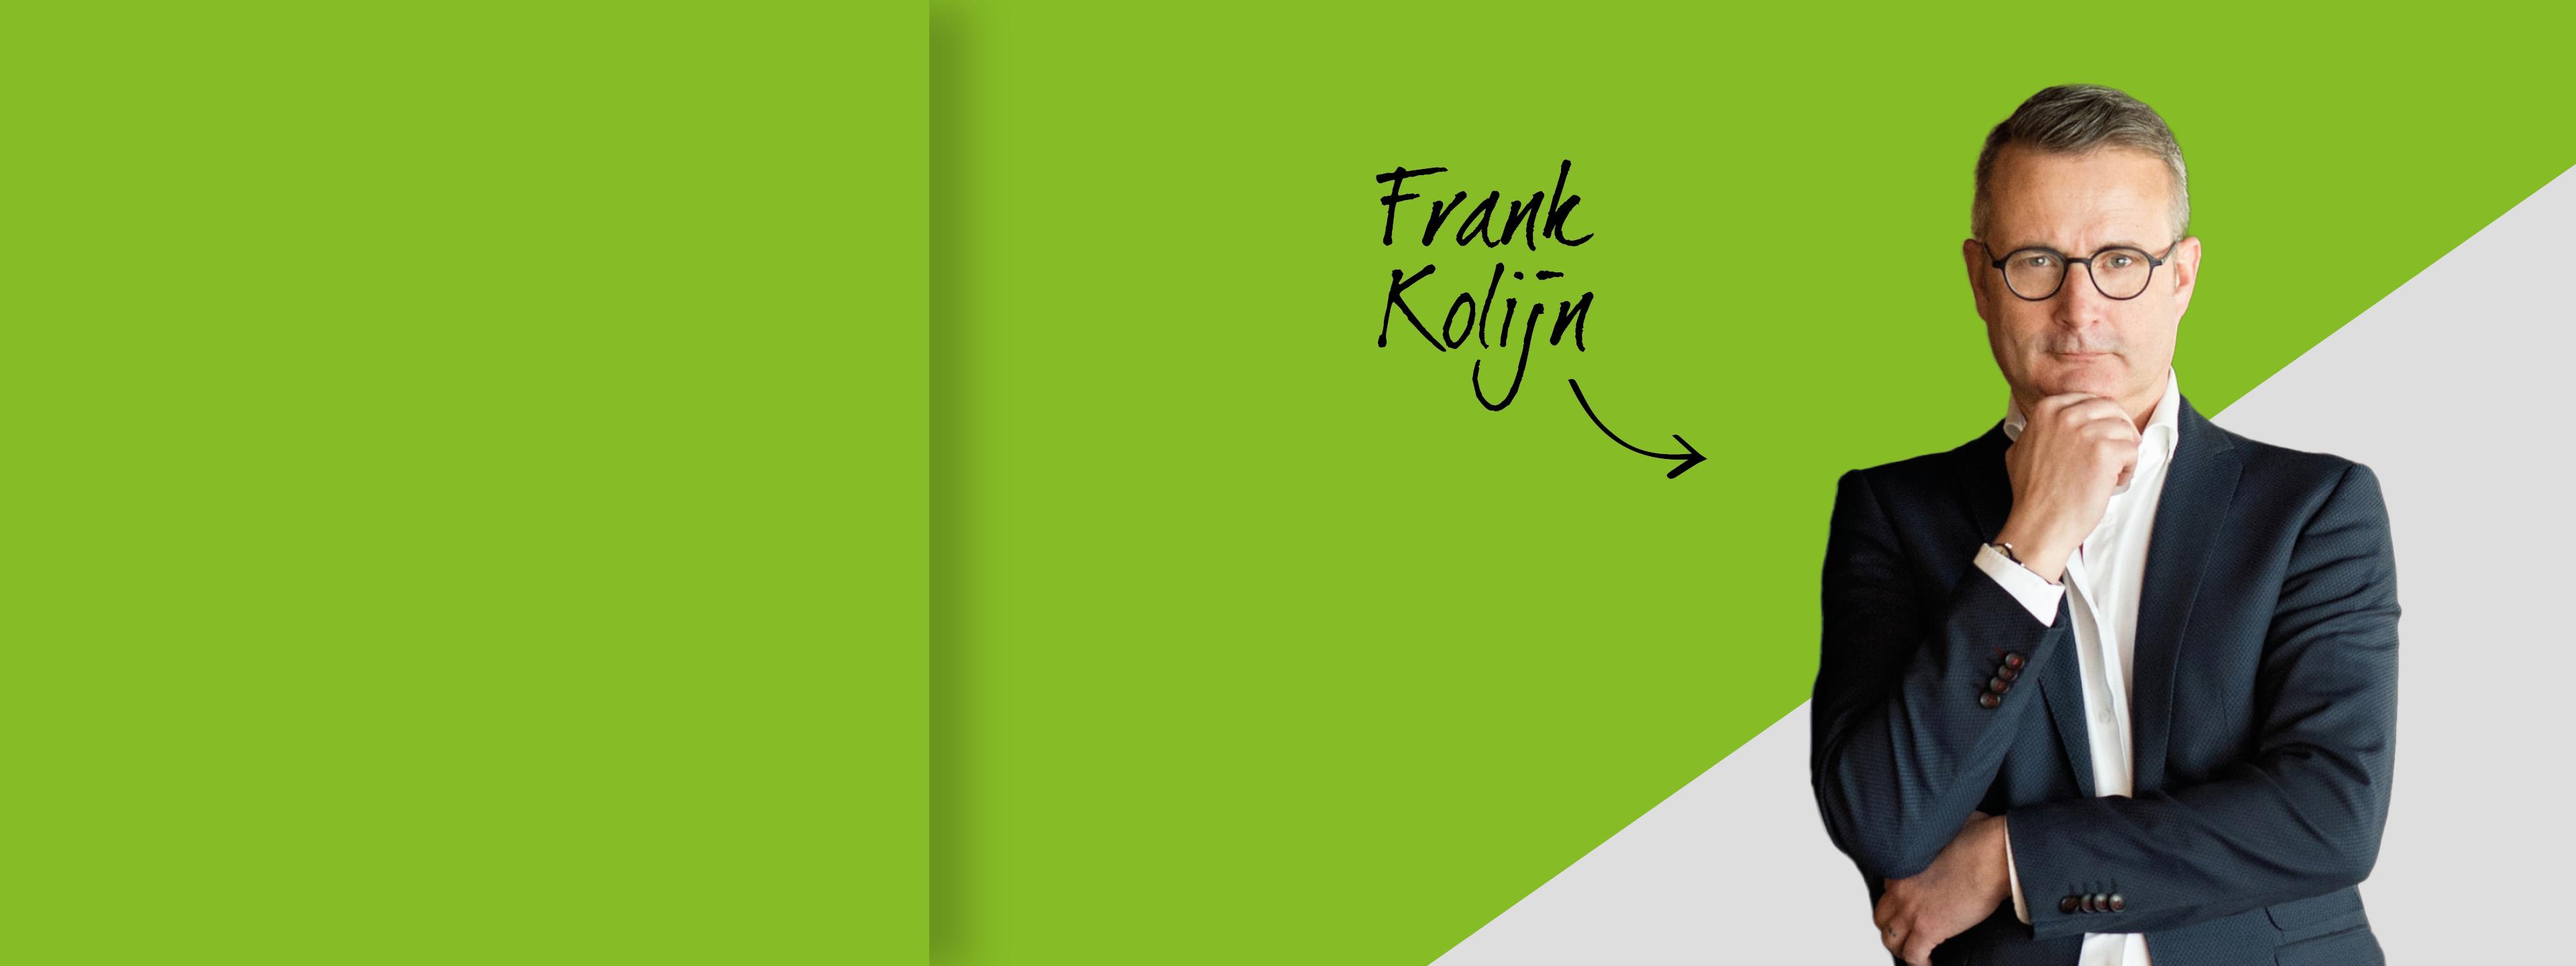 Frank Kolijn, accountant frank